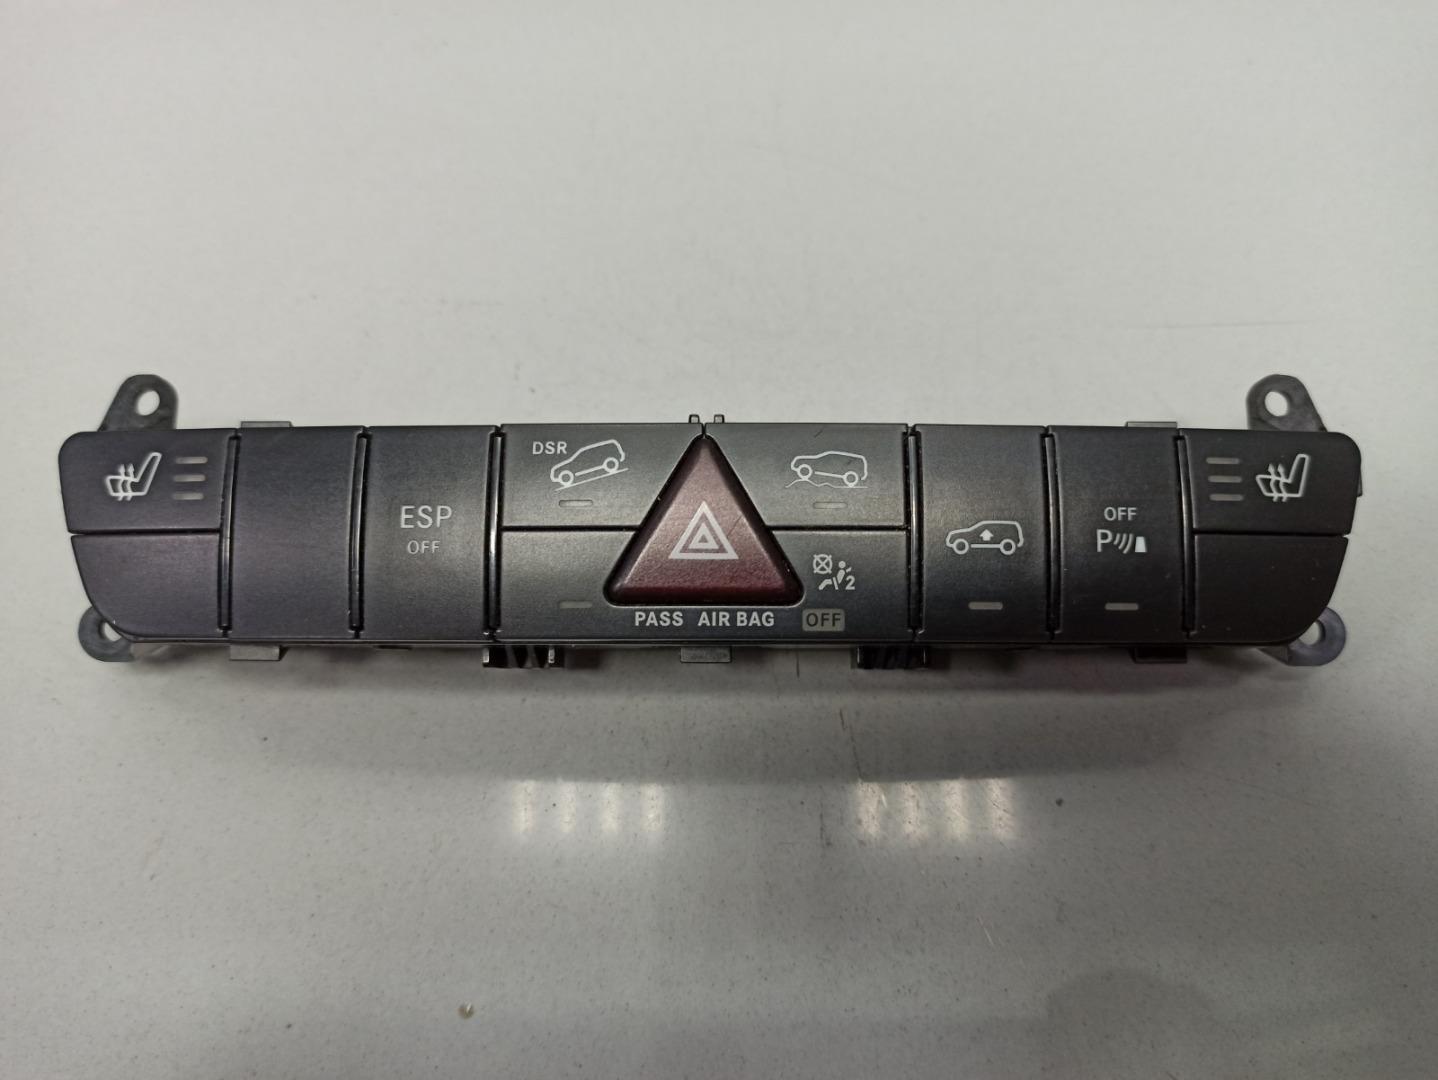 Кнопка аварийной сигнализации Mercedes Gl Class X164 273.923 2007 (б/у)